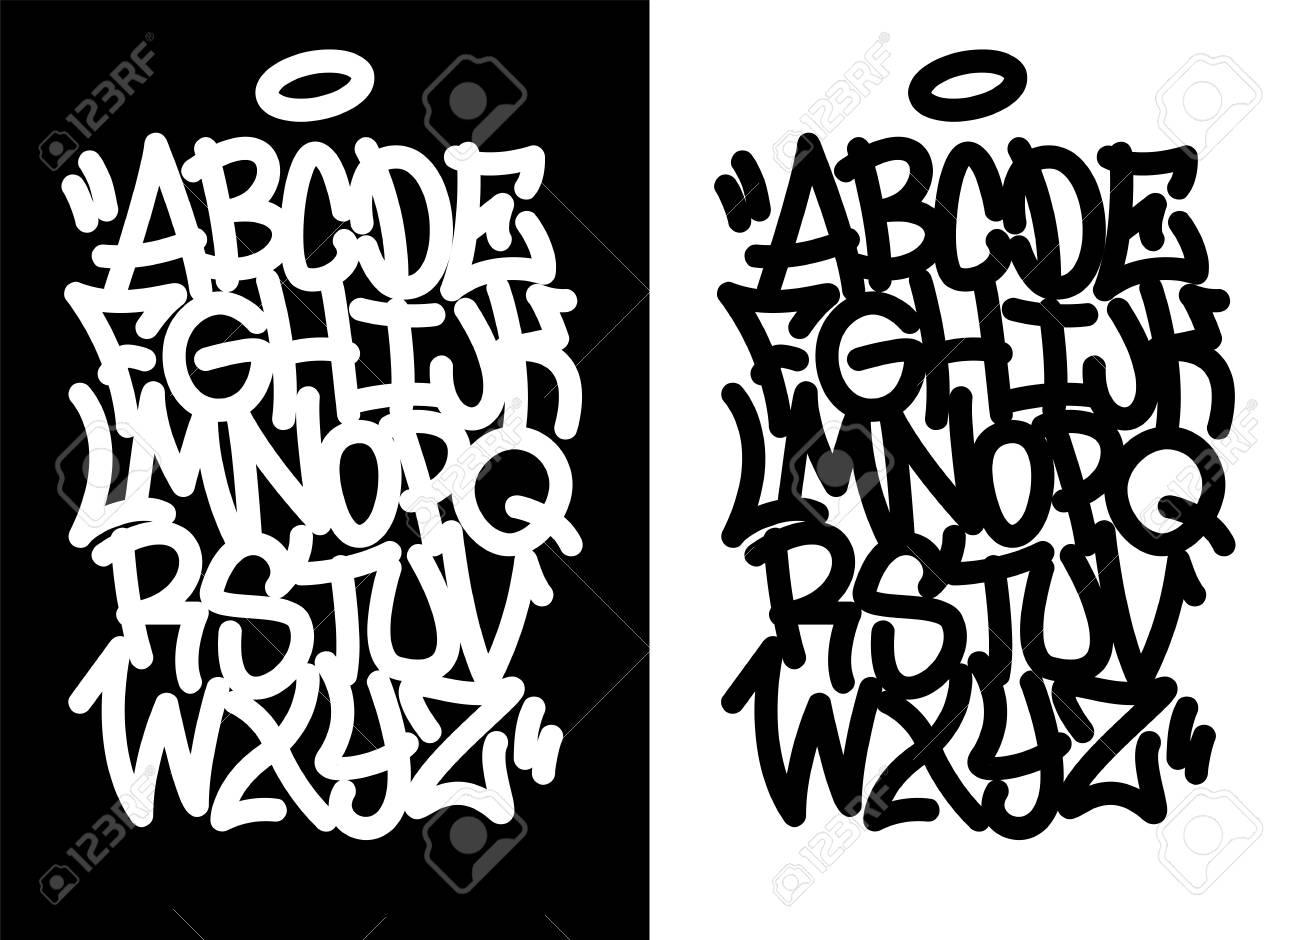 Handwritten graffiti font alphabet. Set on black background. - 112369010